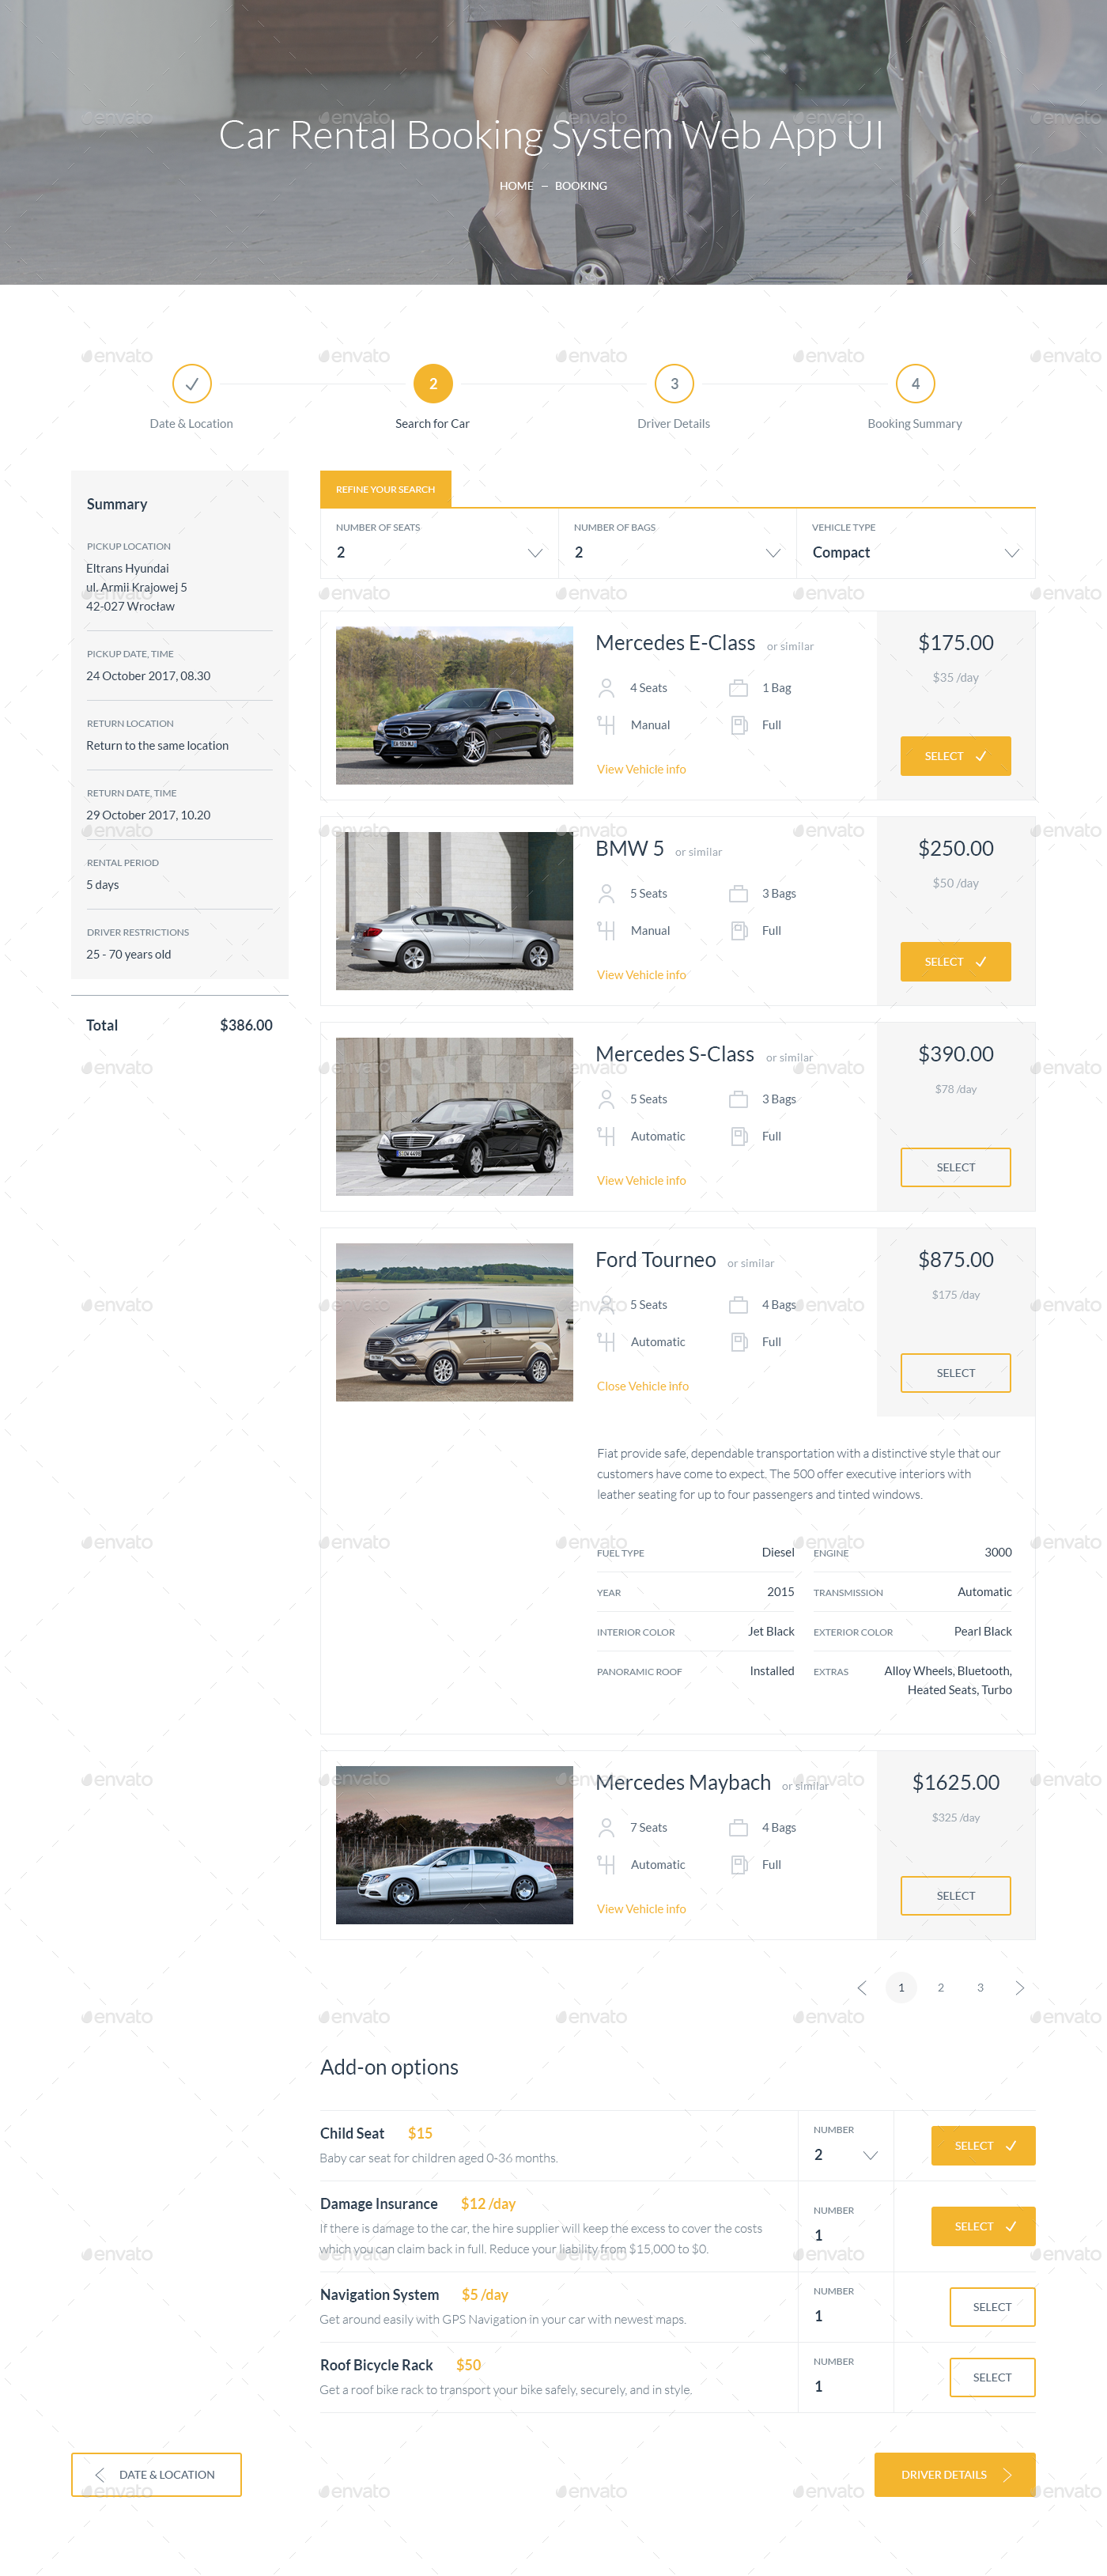 Car Rental Booking System Web App UI